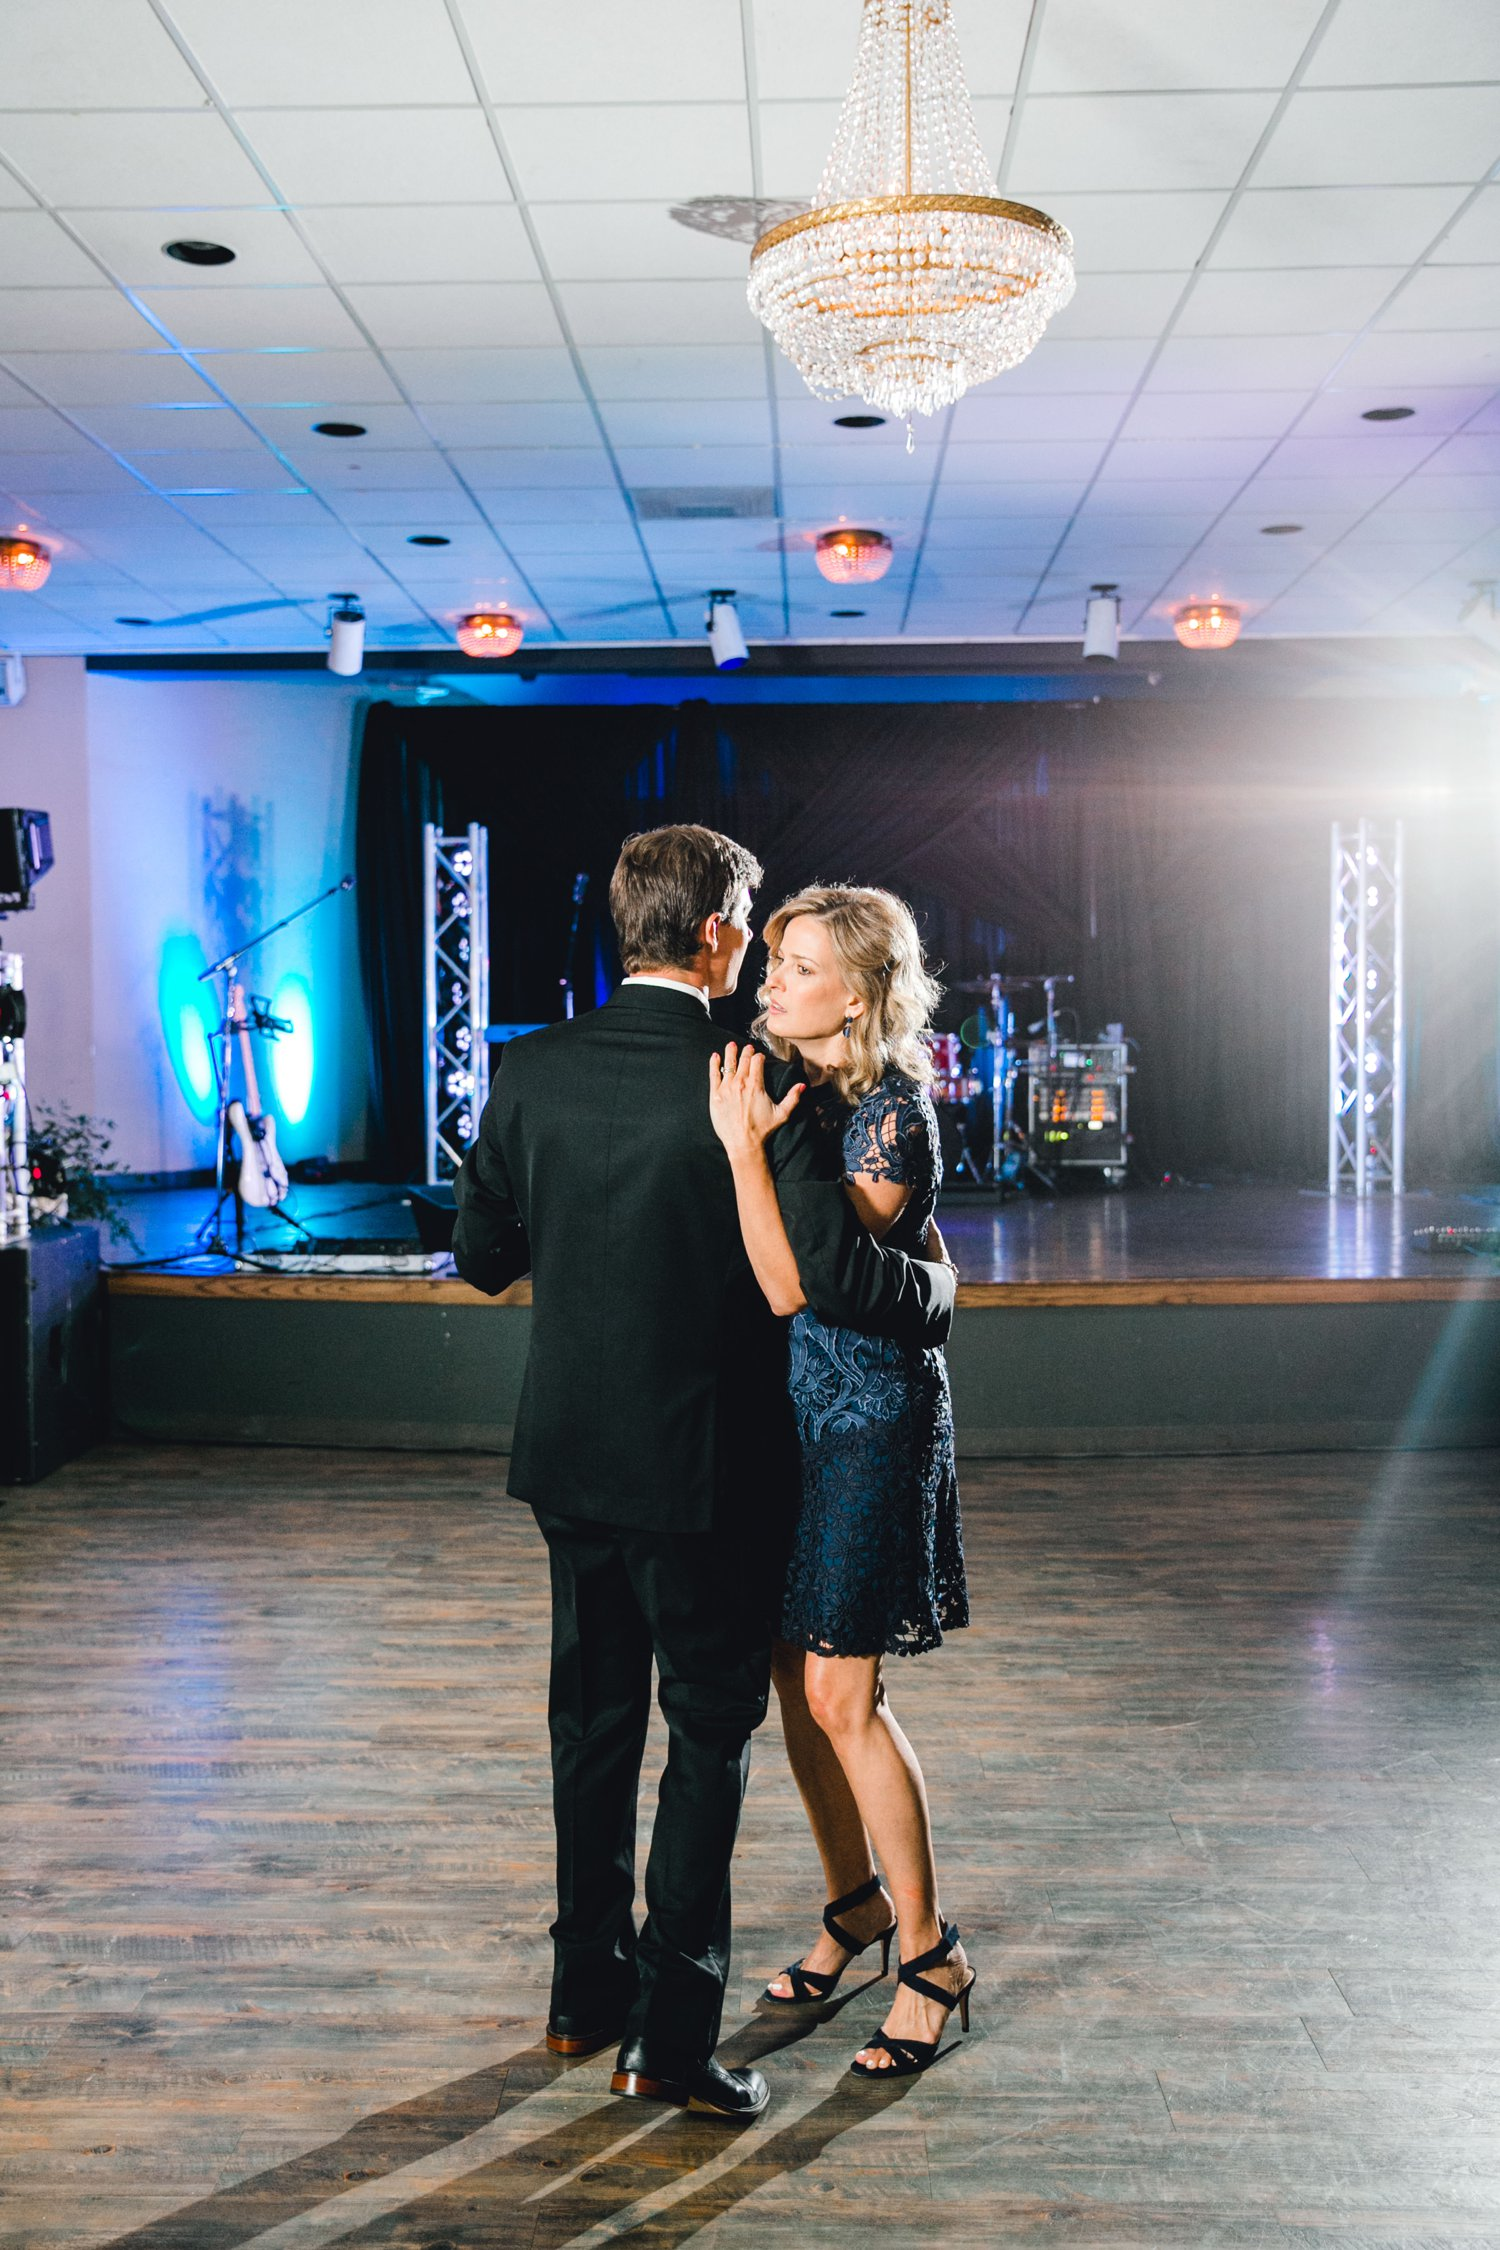 Hunter_and_Molly_Rawls_ALLEEJ_Lubbock_WEDDING_Legacy_Event_Center_0176.jpg